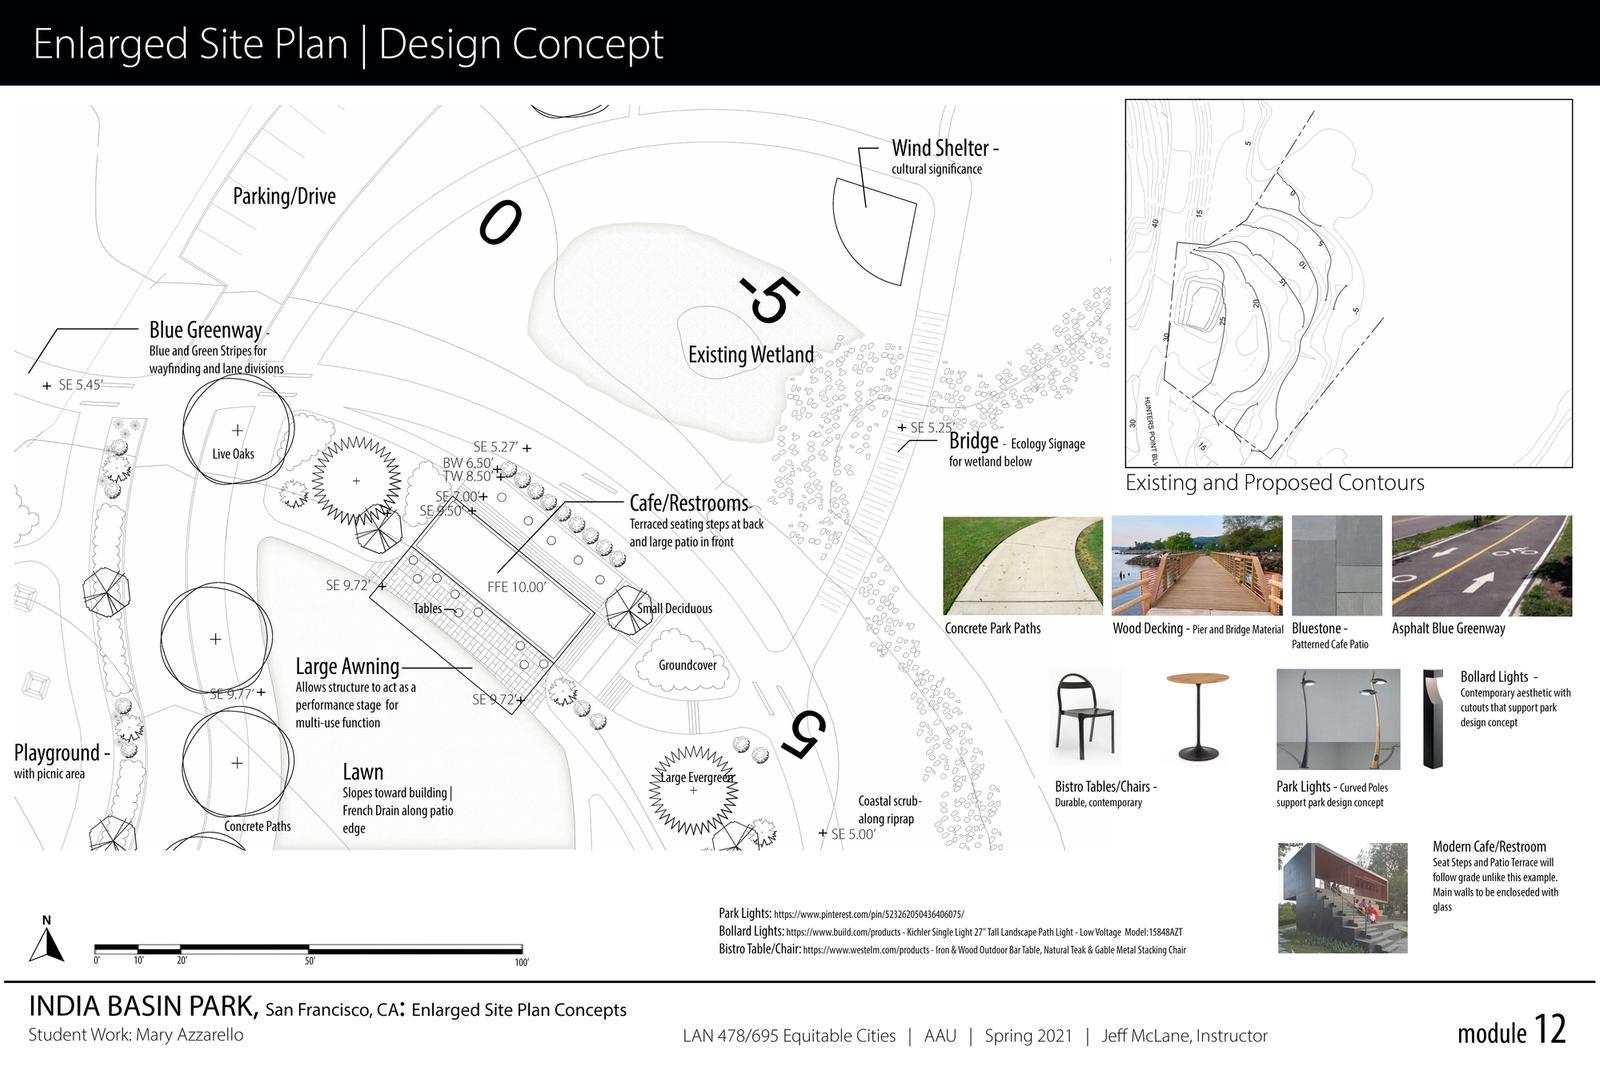 India Basin Park, San Francisco - Enlarged Site Plan 2